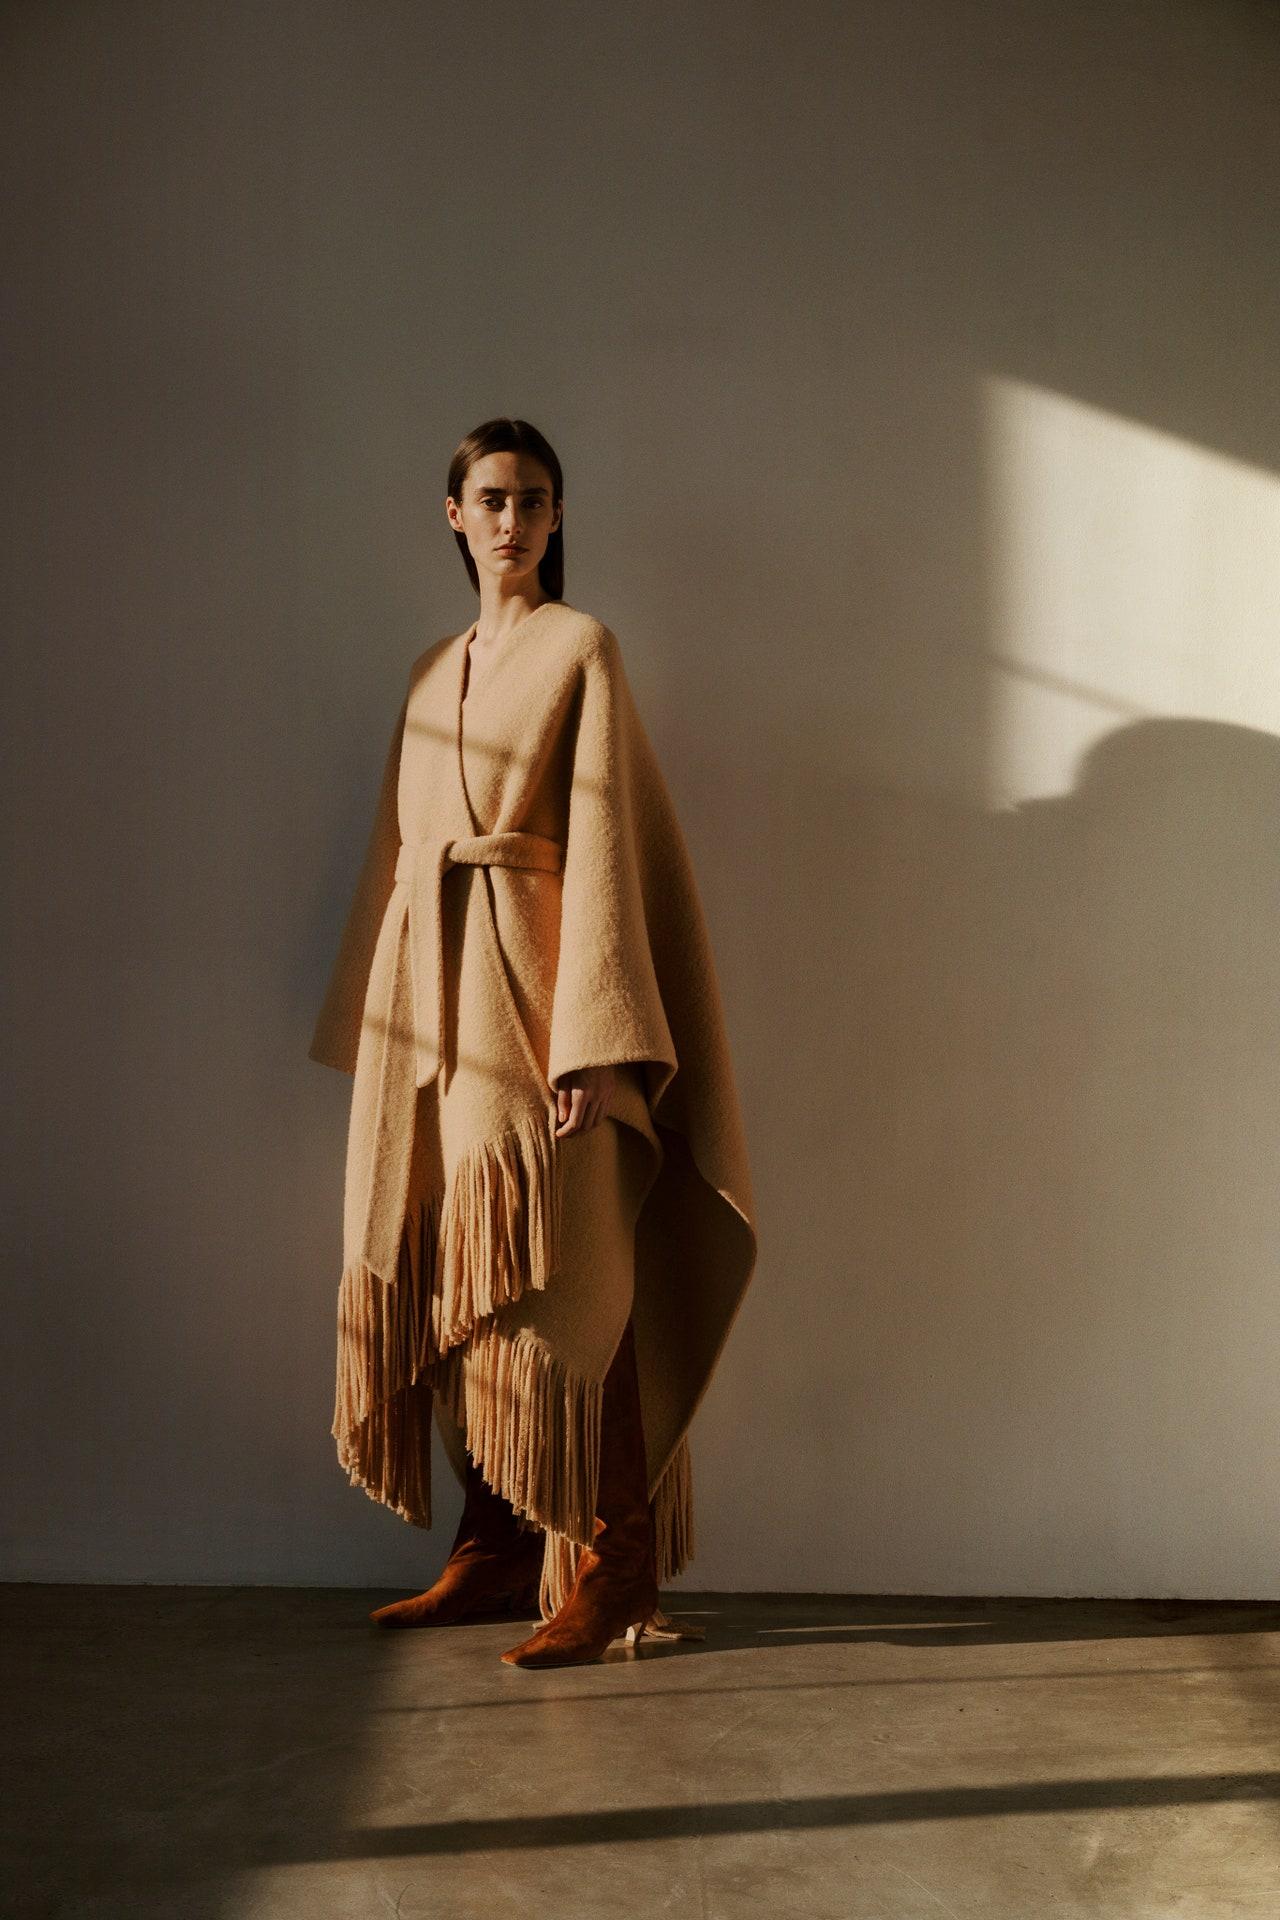 Arje Top 10 Fashion Brands Rising in 2021